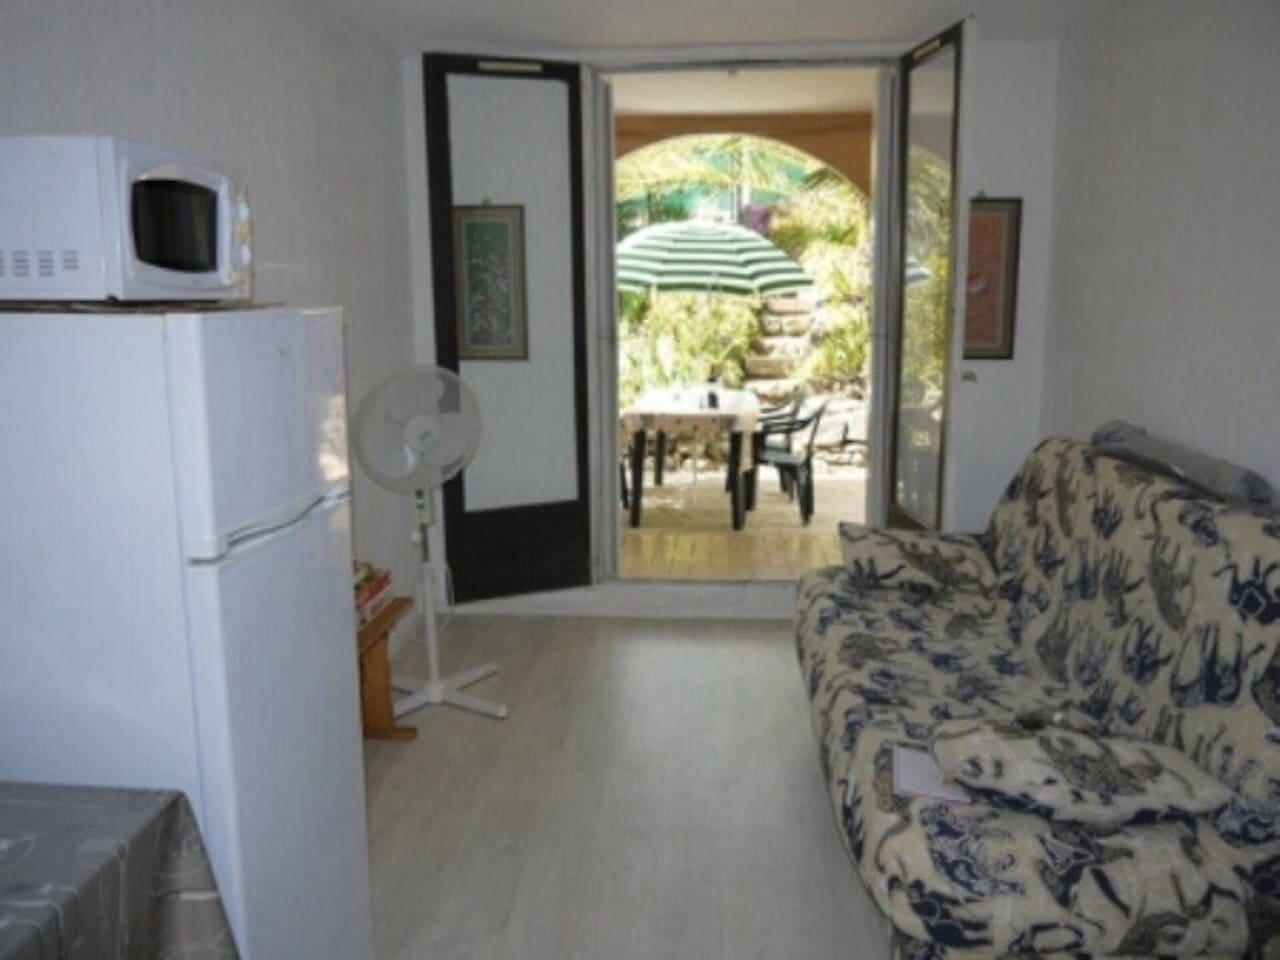 Sofa bed, fridge, microwave, patio, garden